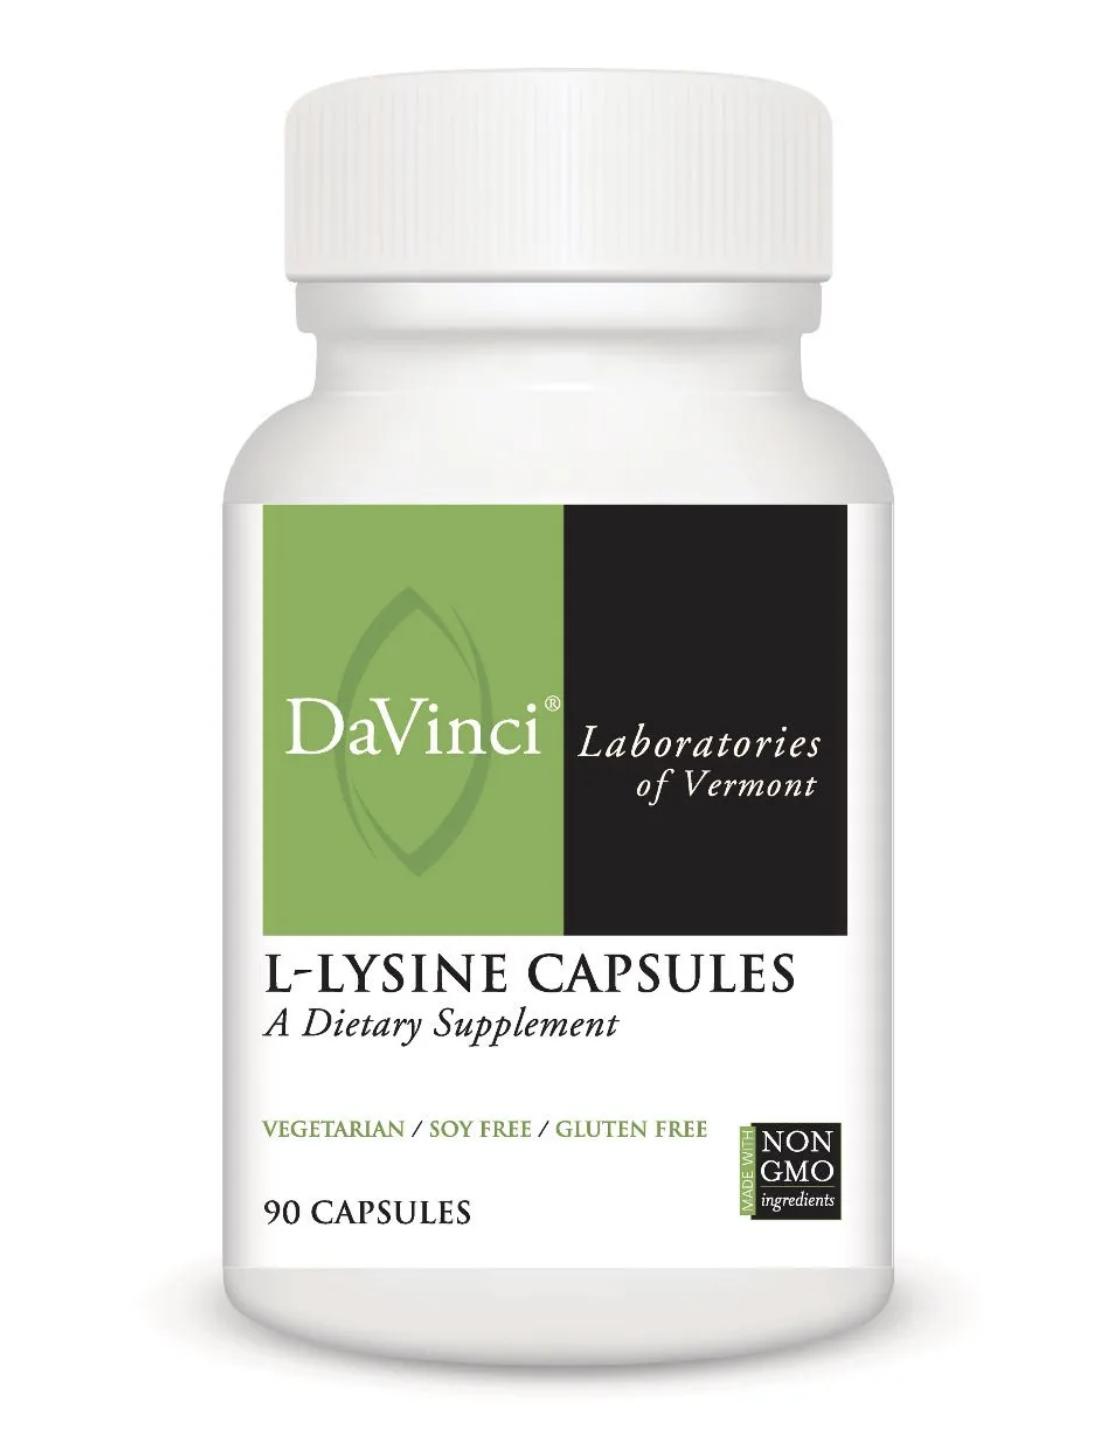 L-LYSINE CAPSULES 90 Vegetarian Capsules DaVinci Laboratories